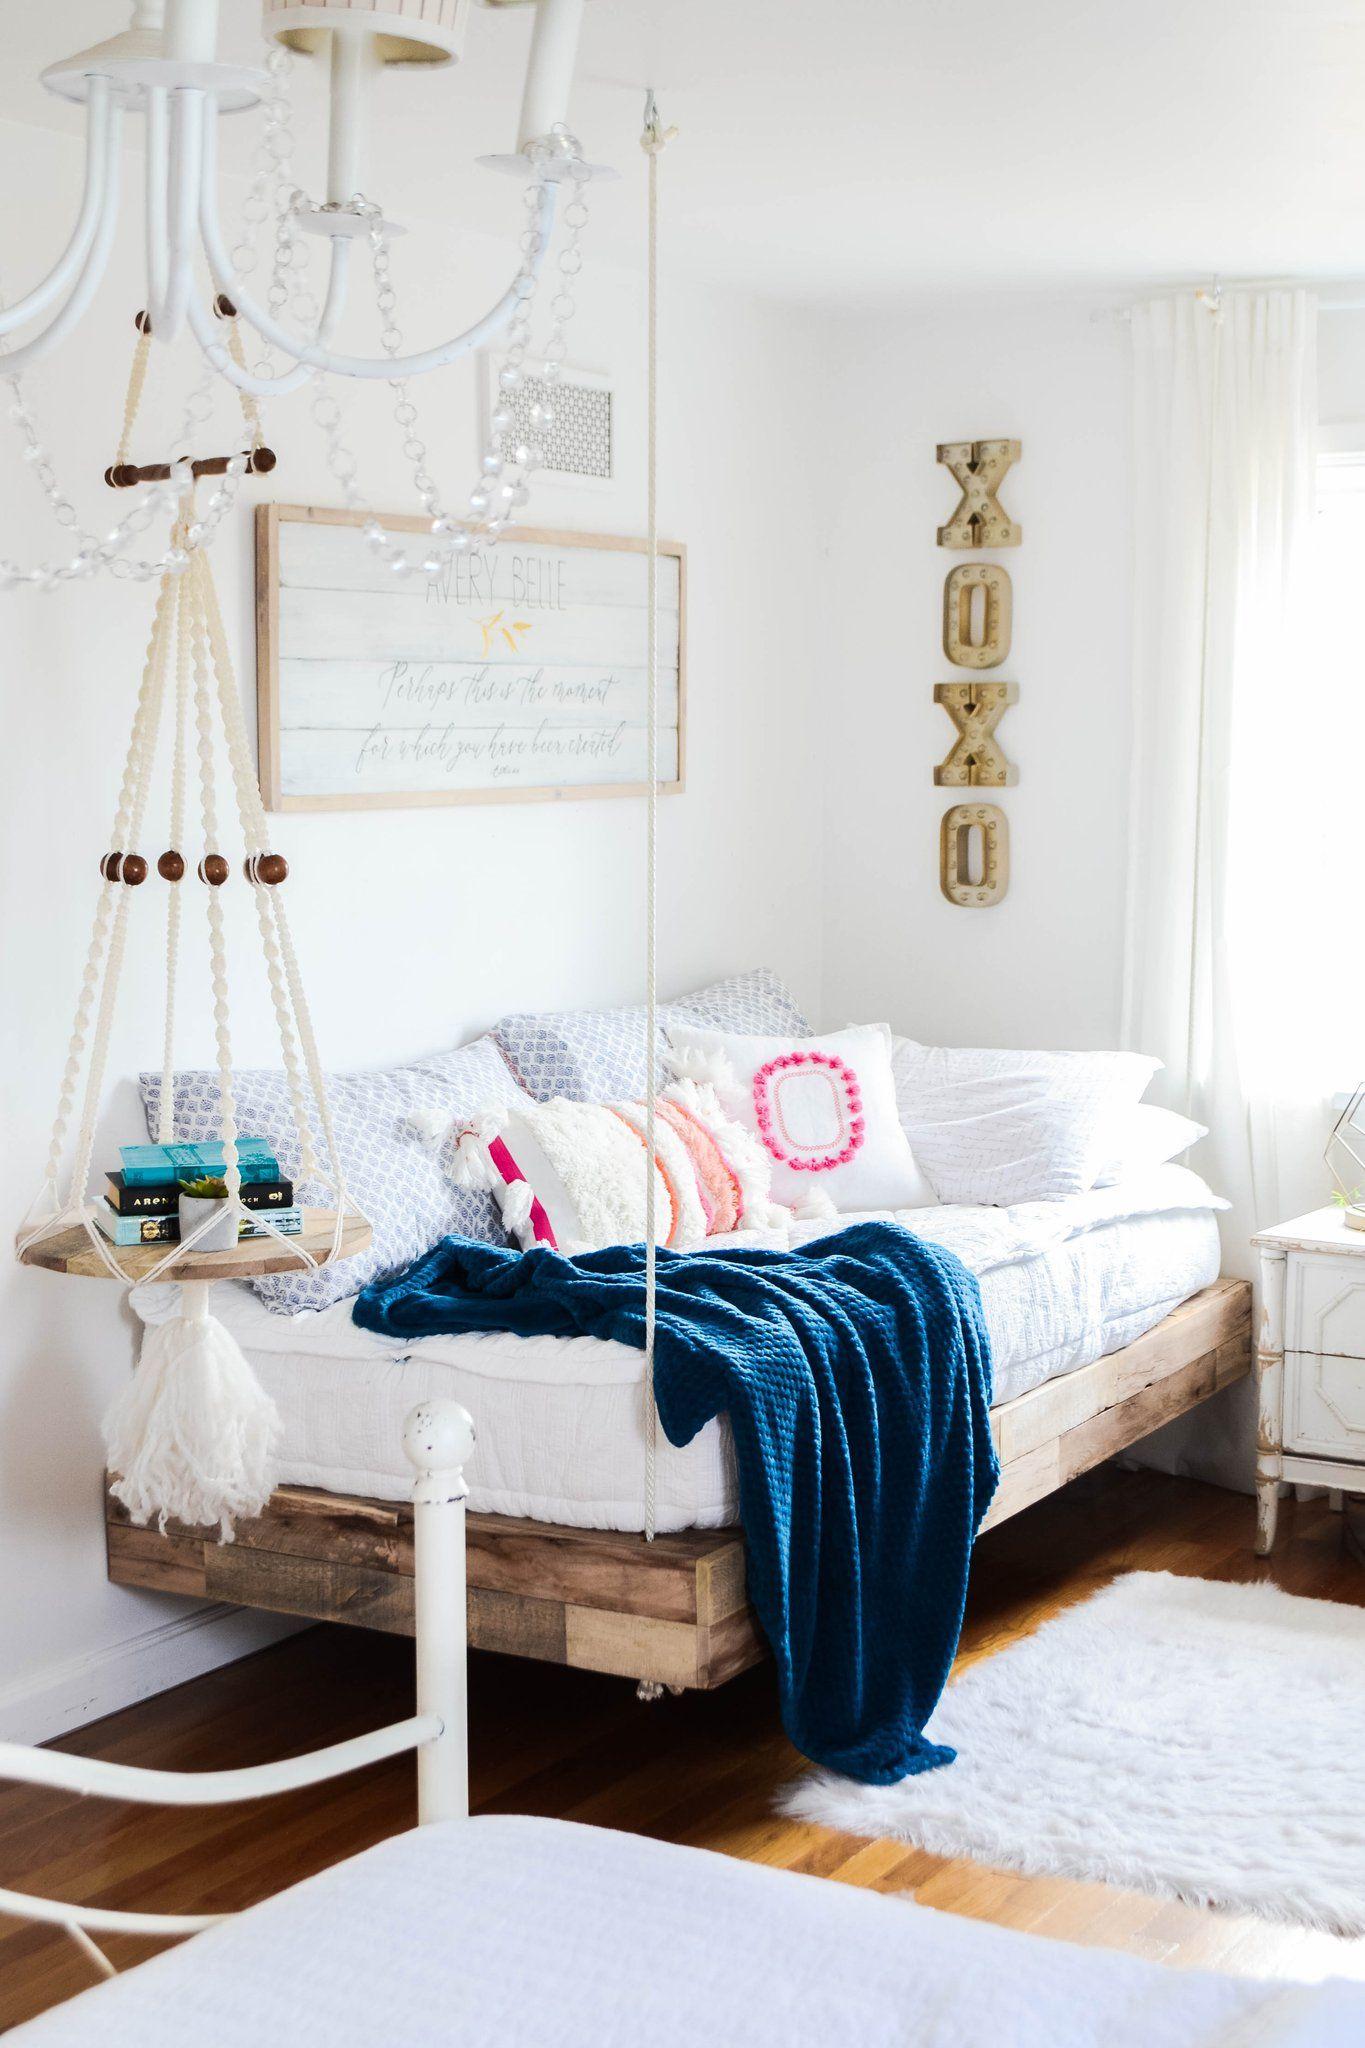 Girls Room Refresh With Diy Hanging Bed Girls Room Decor Bedroom Diy Decor